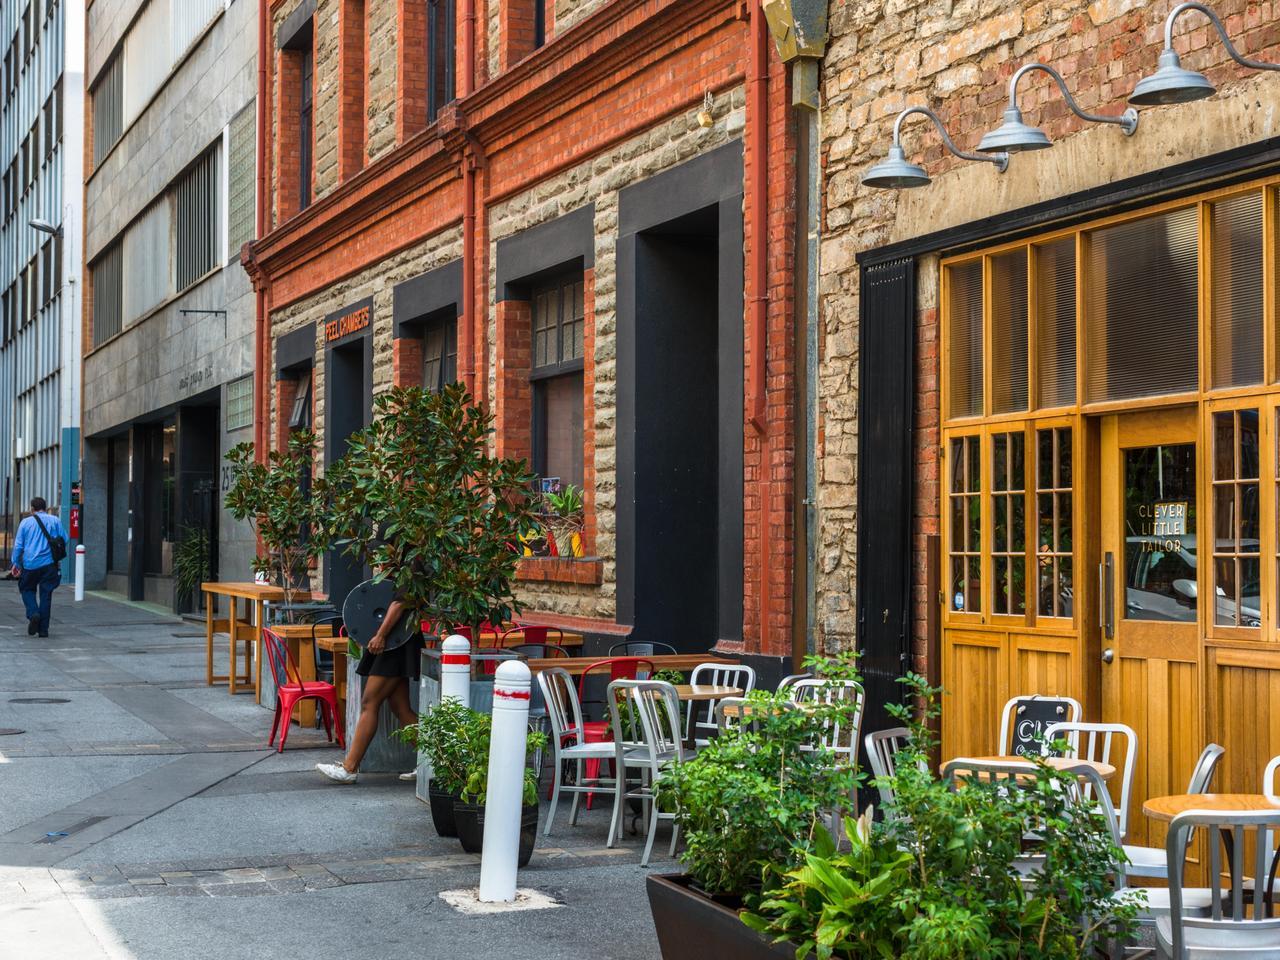 Bars on Peel street, Adelaide, South Australia. Australia.